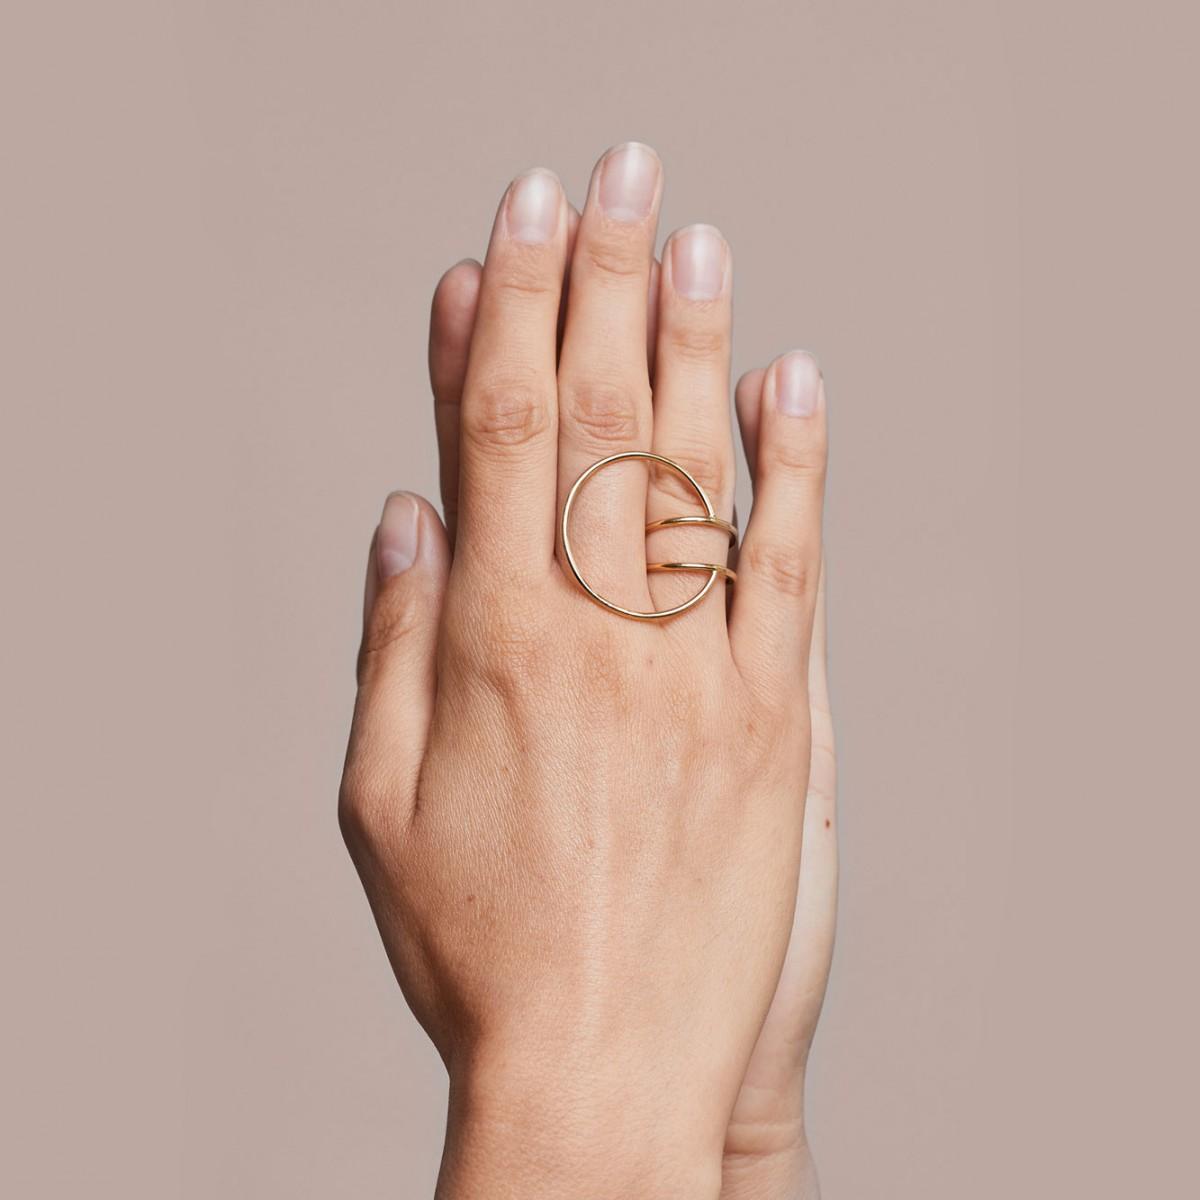 lunar ring extended - 925 Sterlingsilber weiß rhodiniert